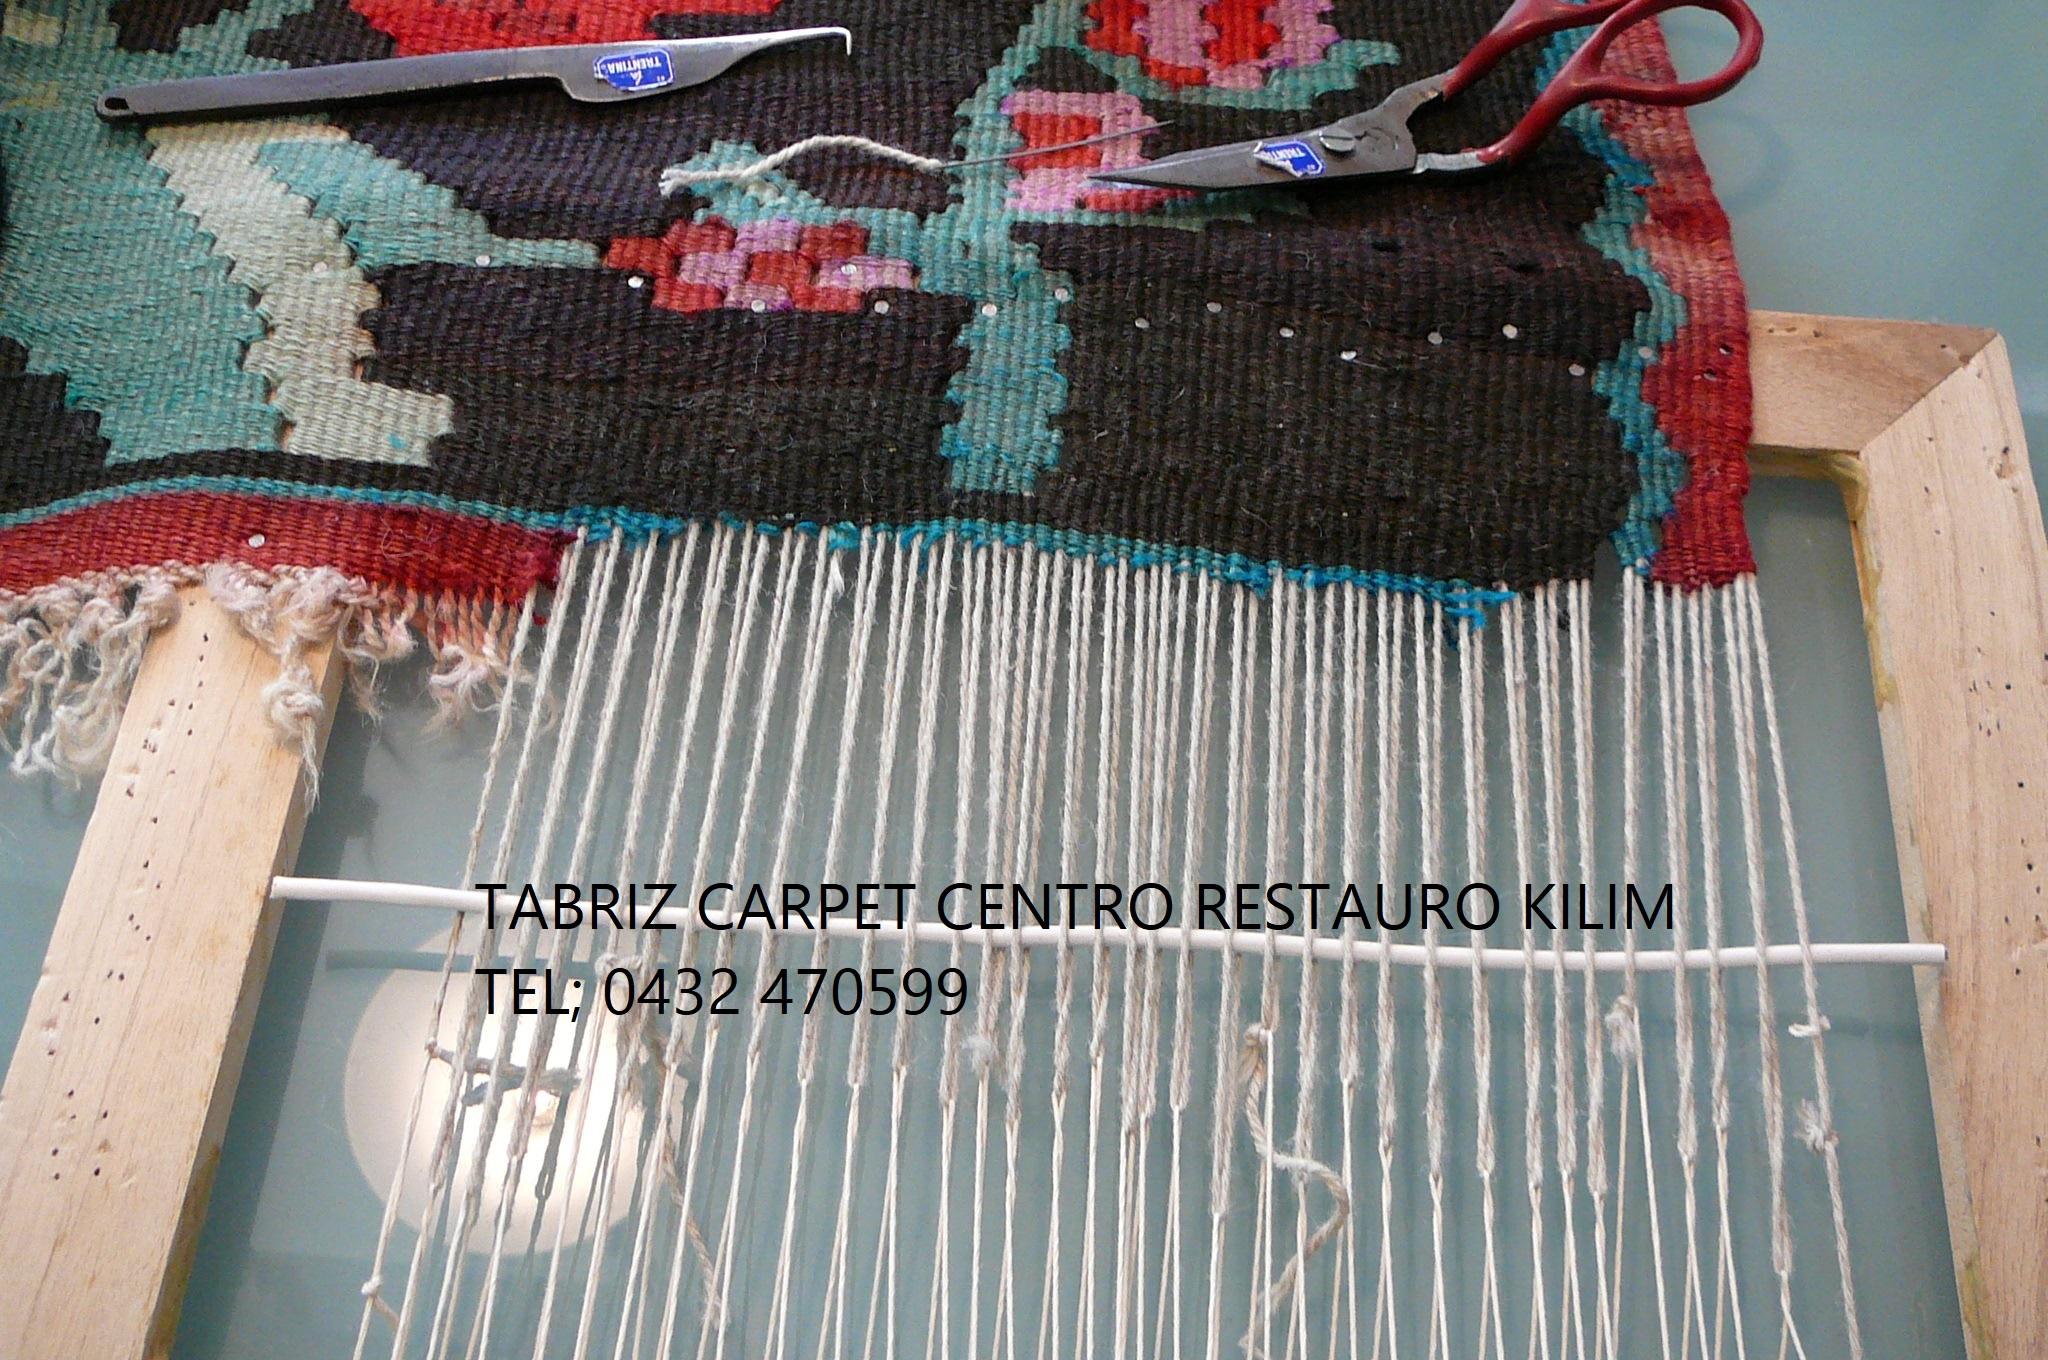 Tappeti Tabriz carpet Udine- Restauro artistico kilim antico messo su telaio